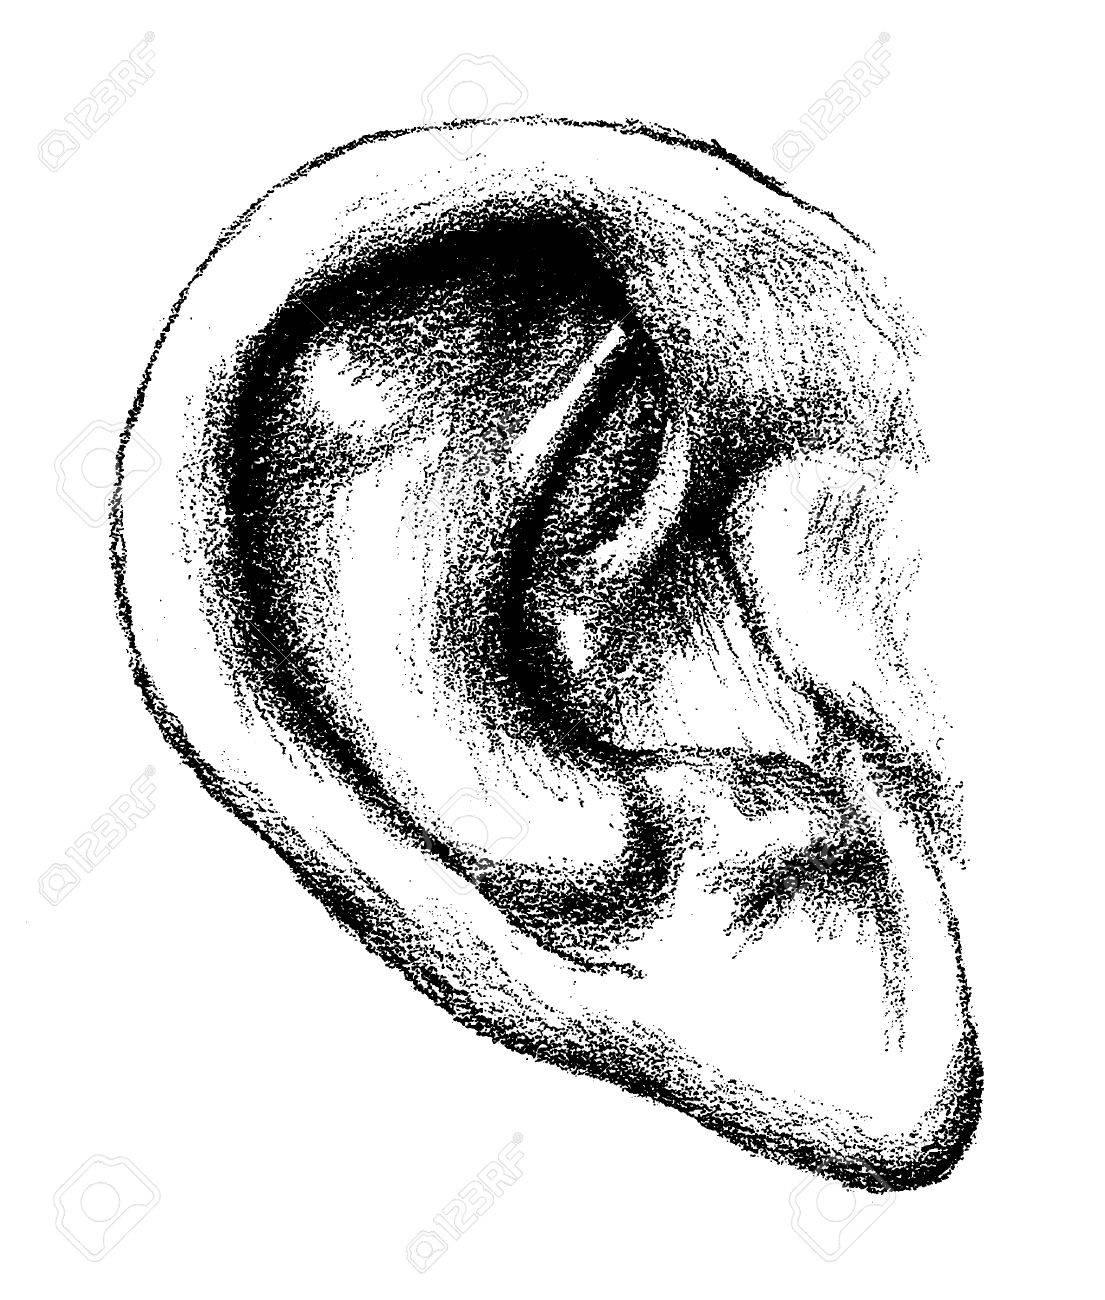 Pencil drawing of an ear art illustration